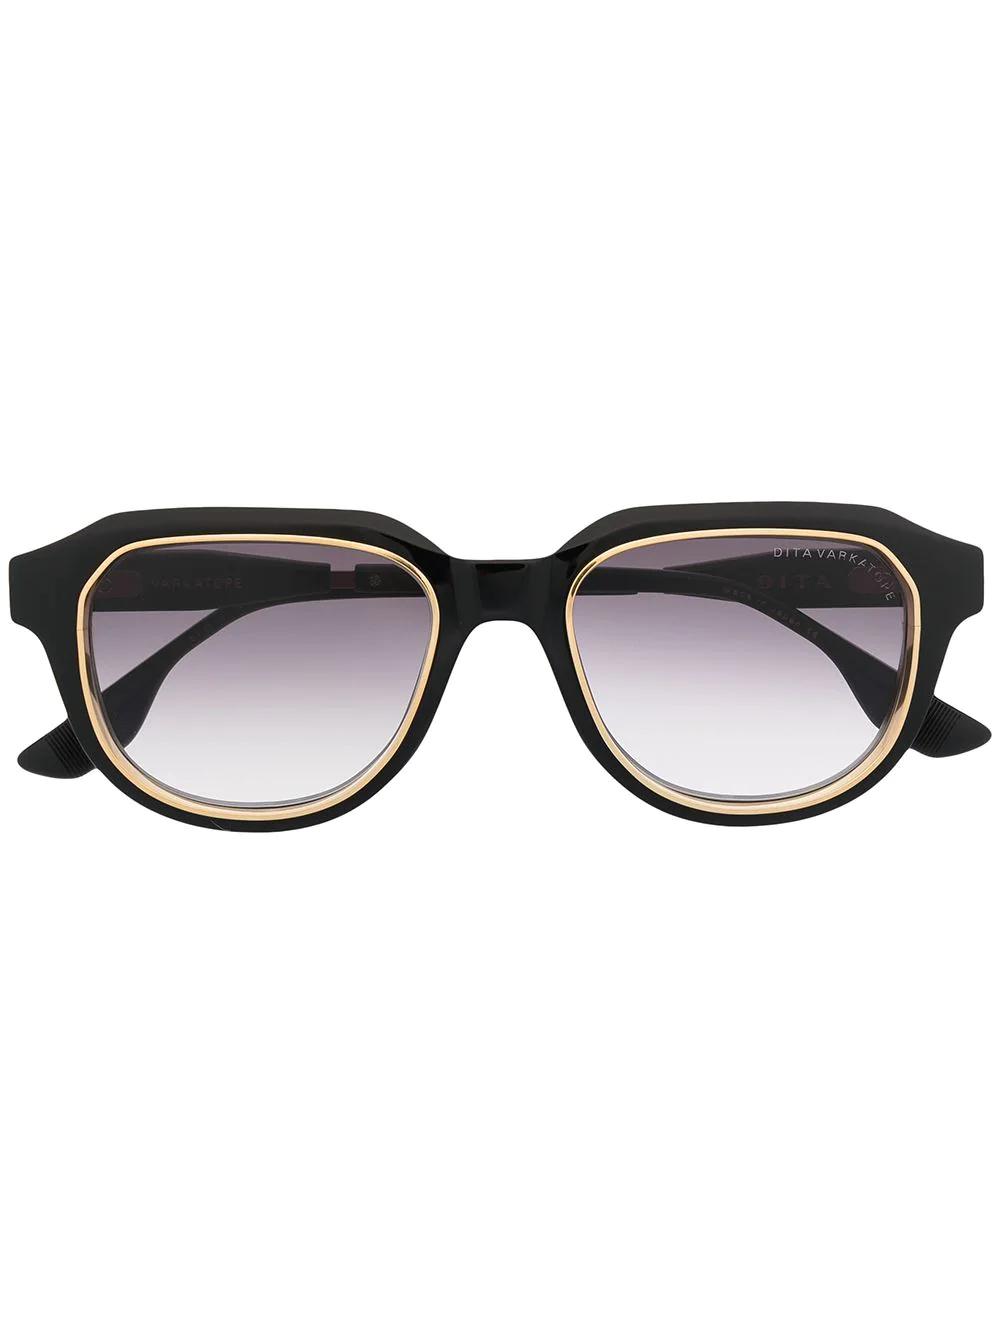 DITA EYEWEAR | Dita Eyewear солнцезащитные очки в круглой оправе | Clouty